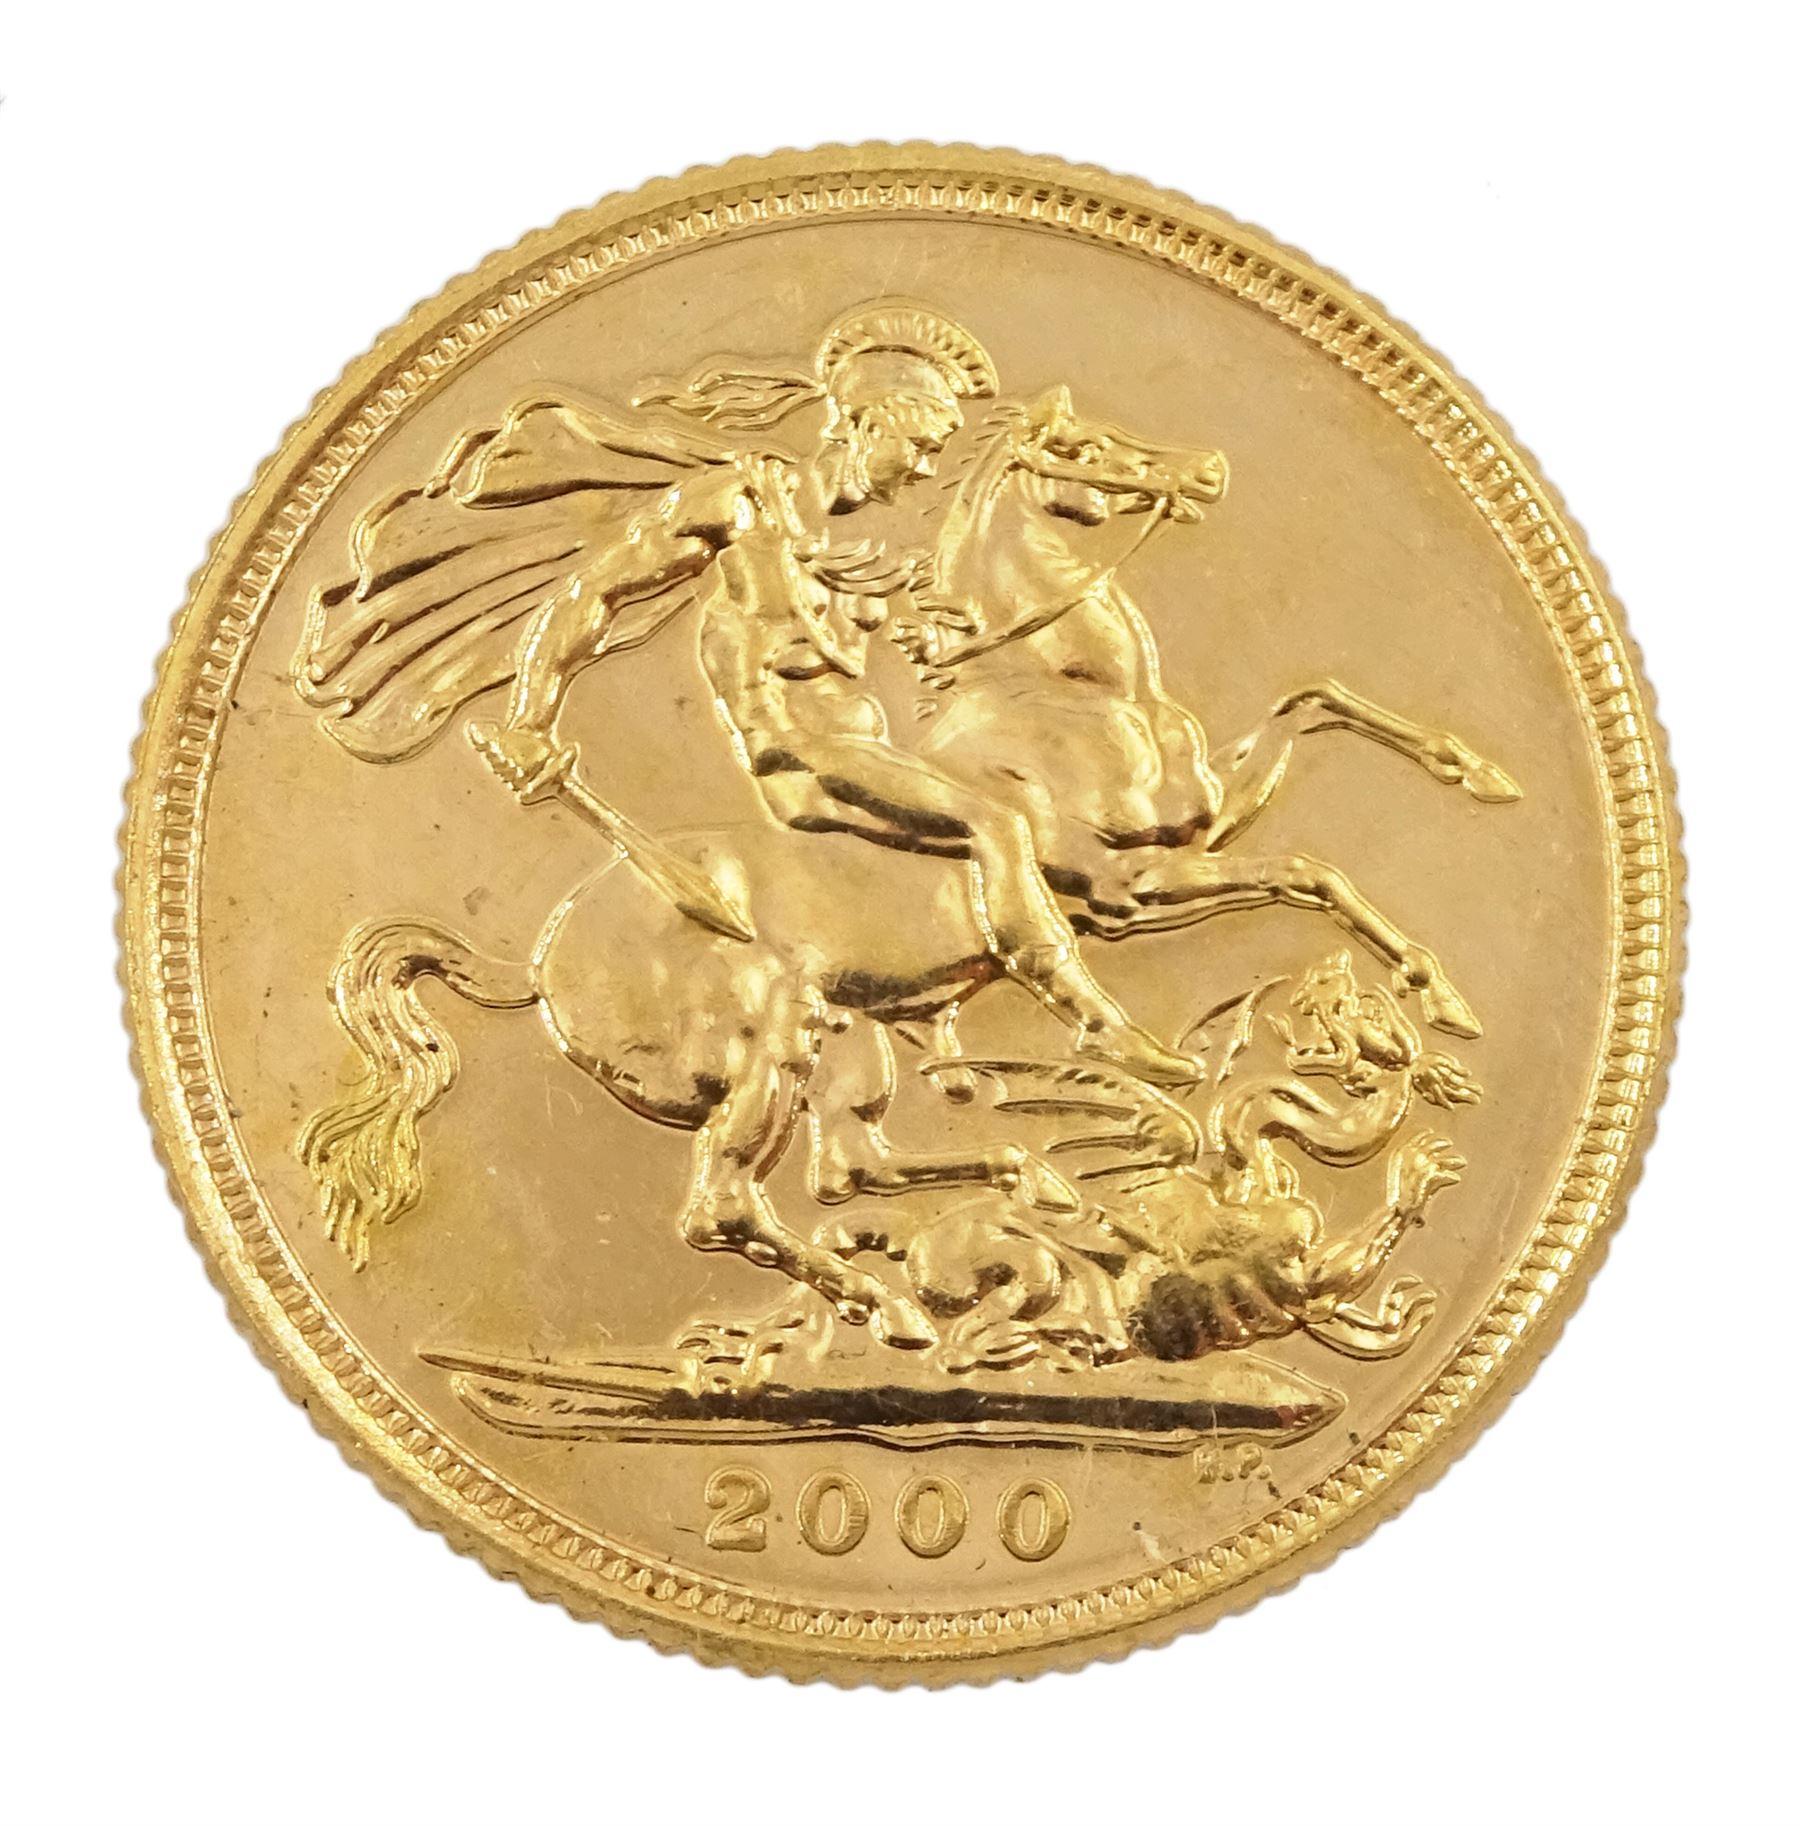 Queen Elizabeth II 2000 gold full sovereign coin - Image 3 of 3